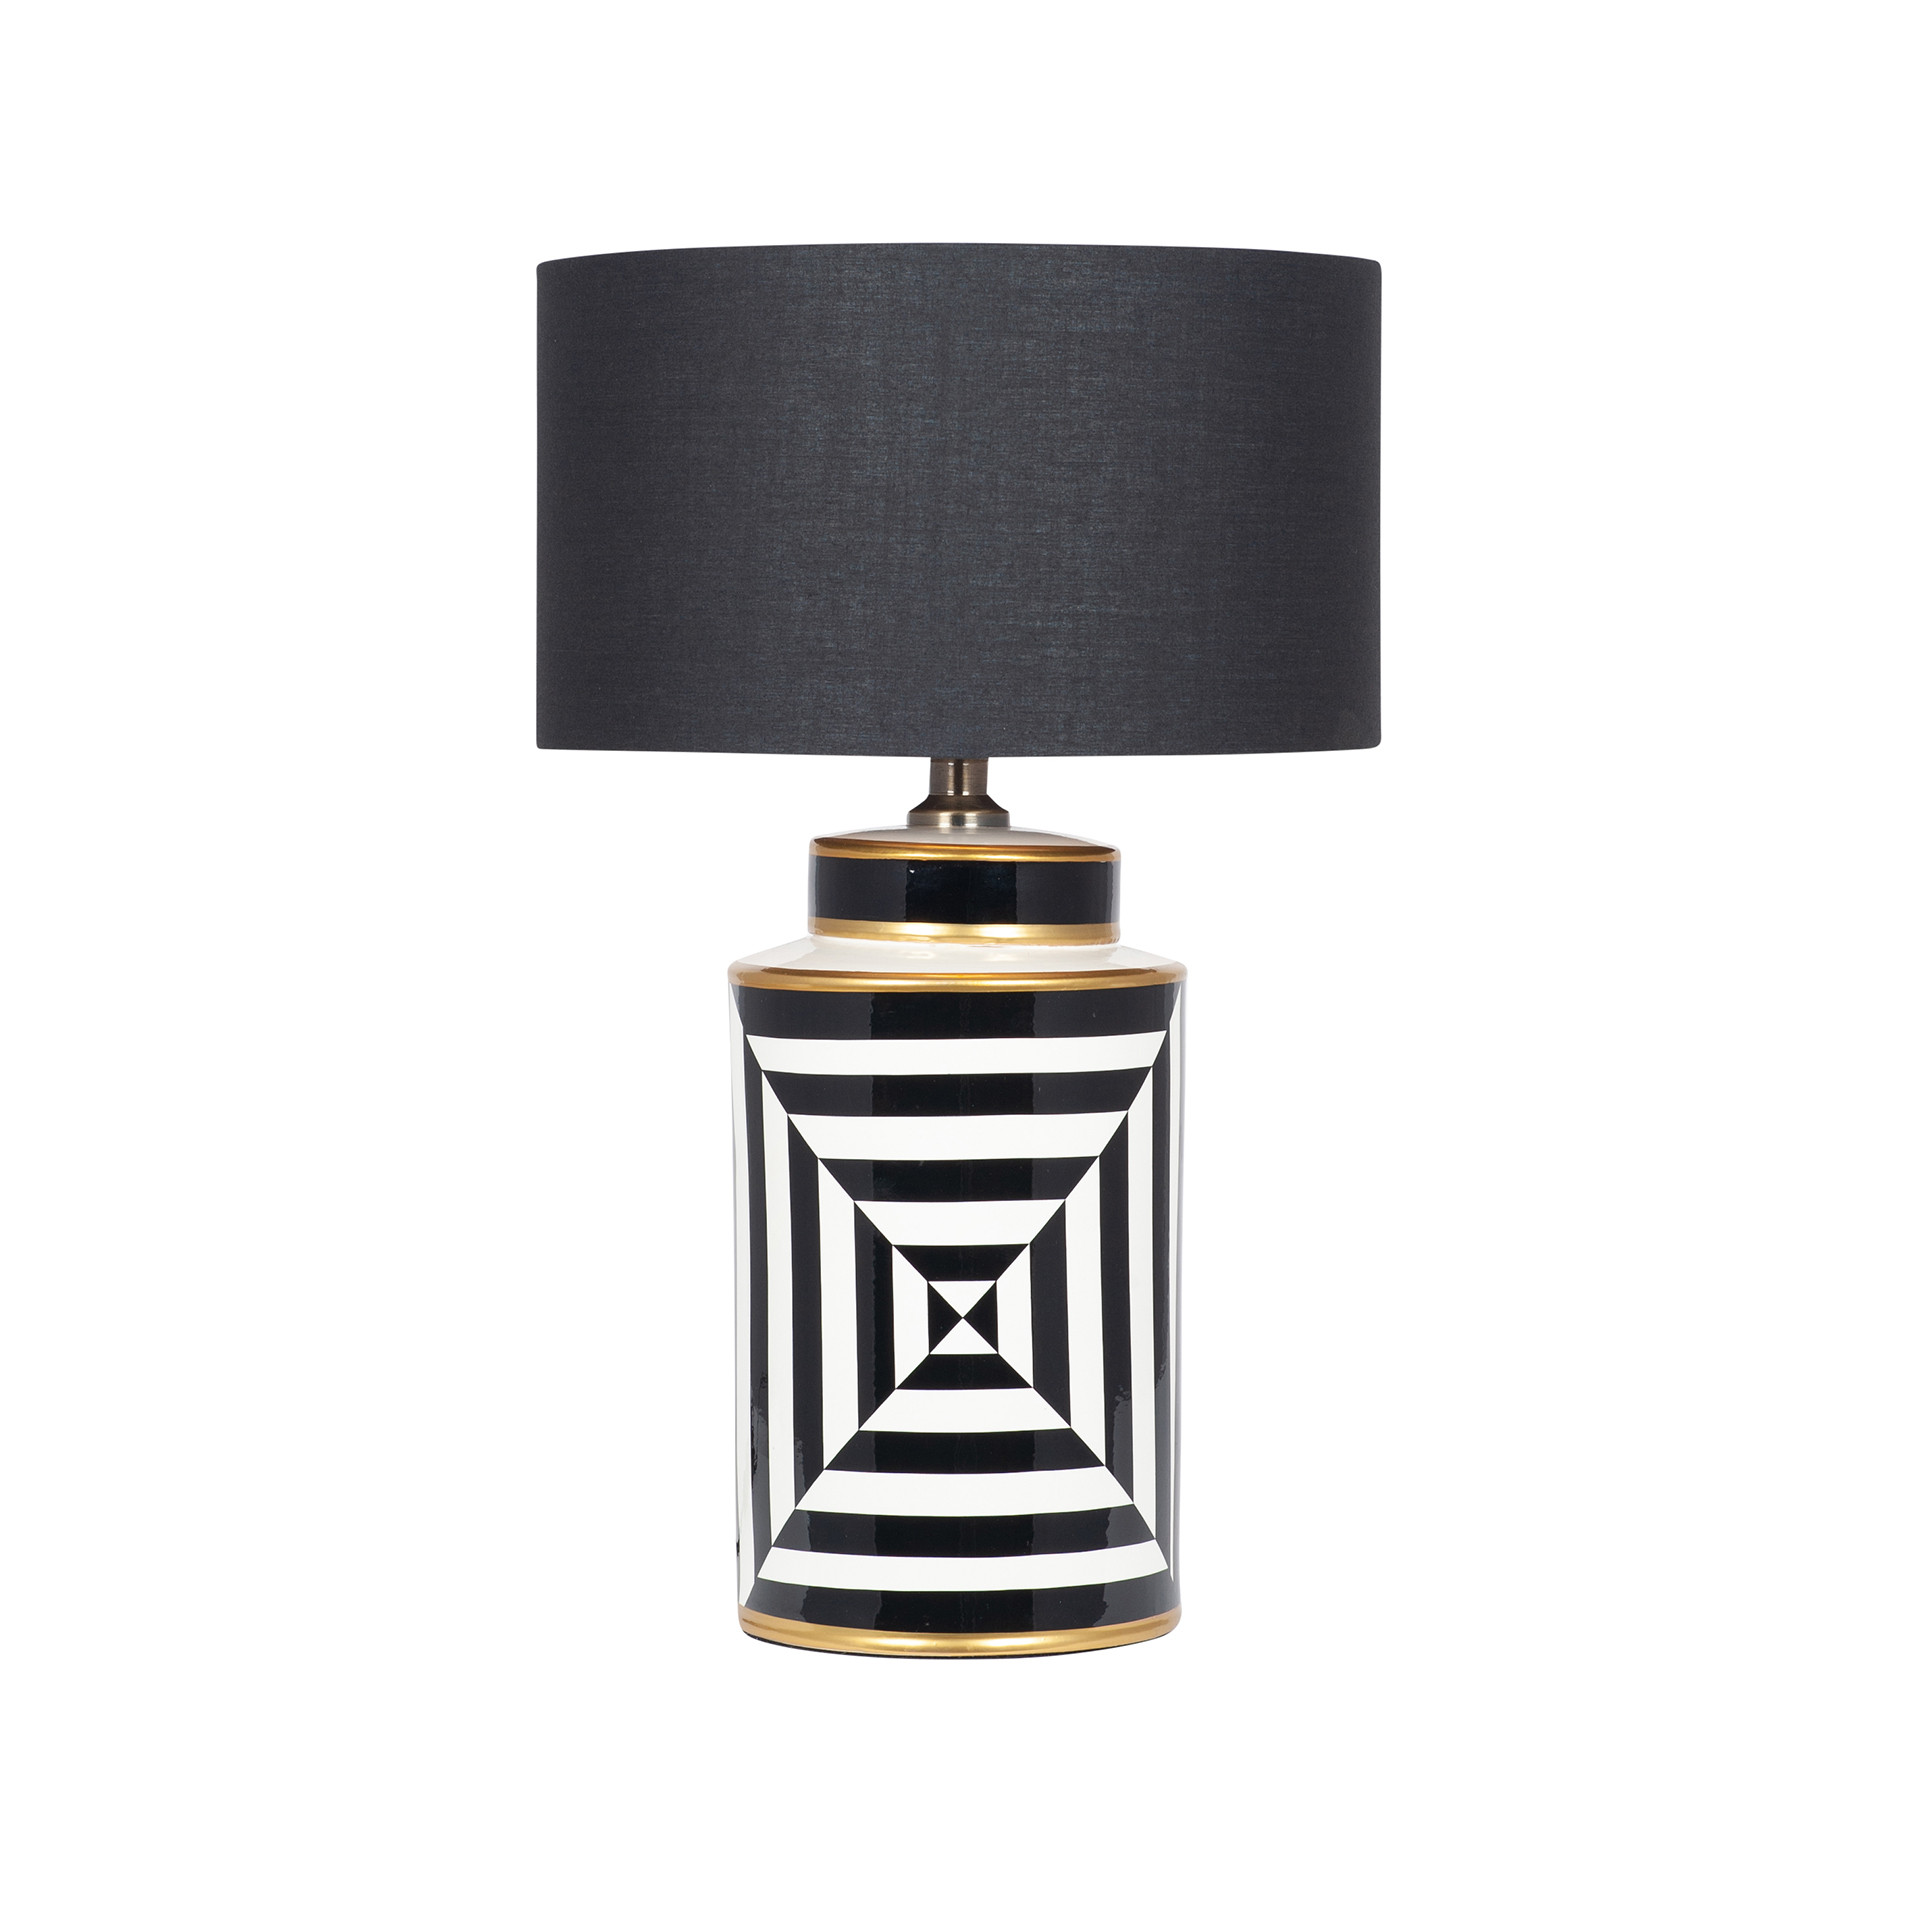 Monochrome Striped Table Lamp